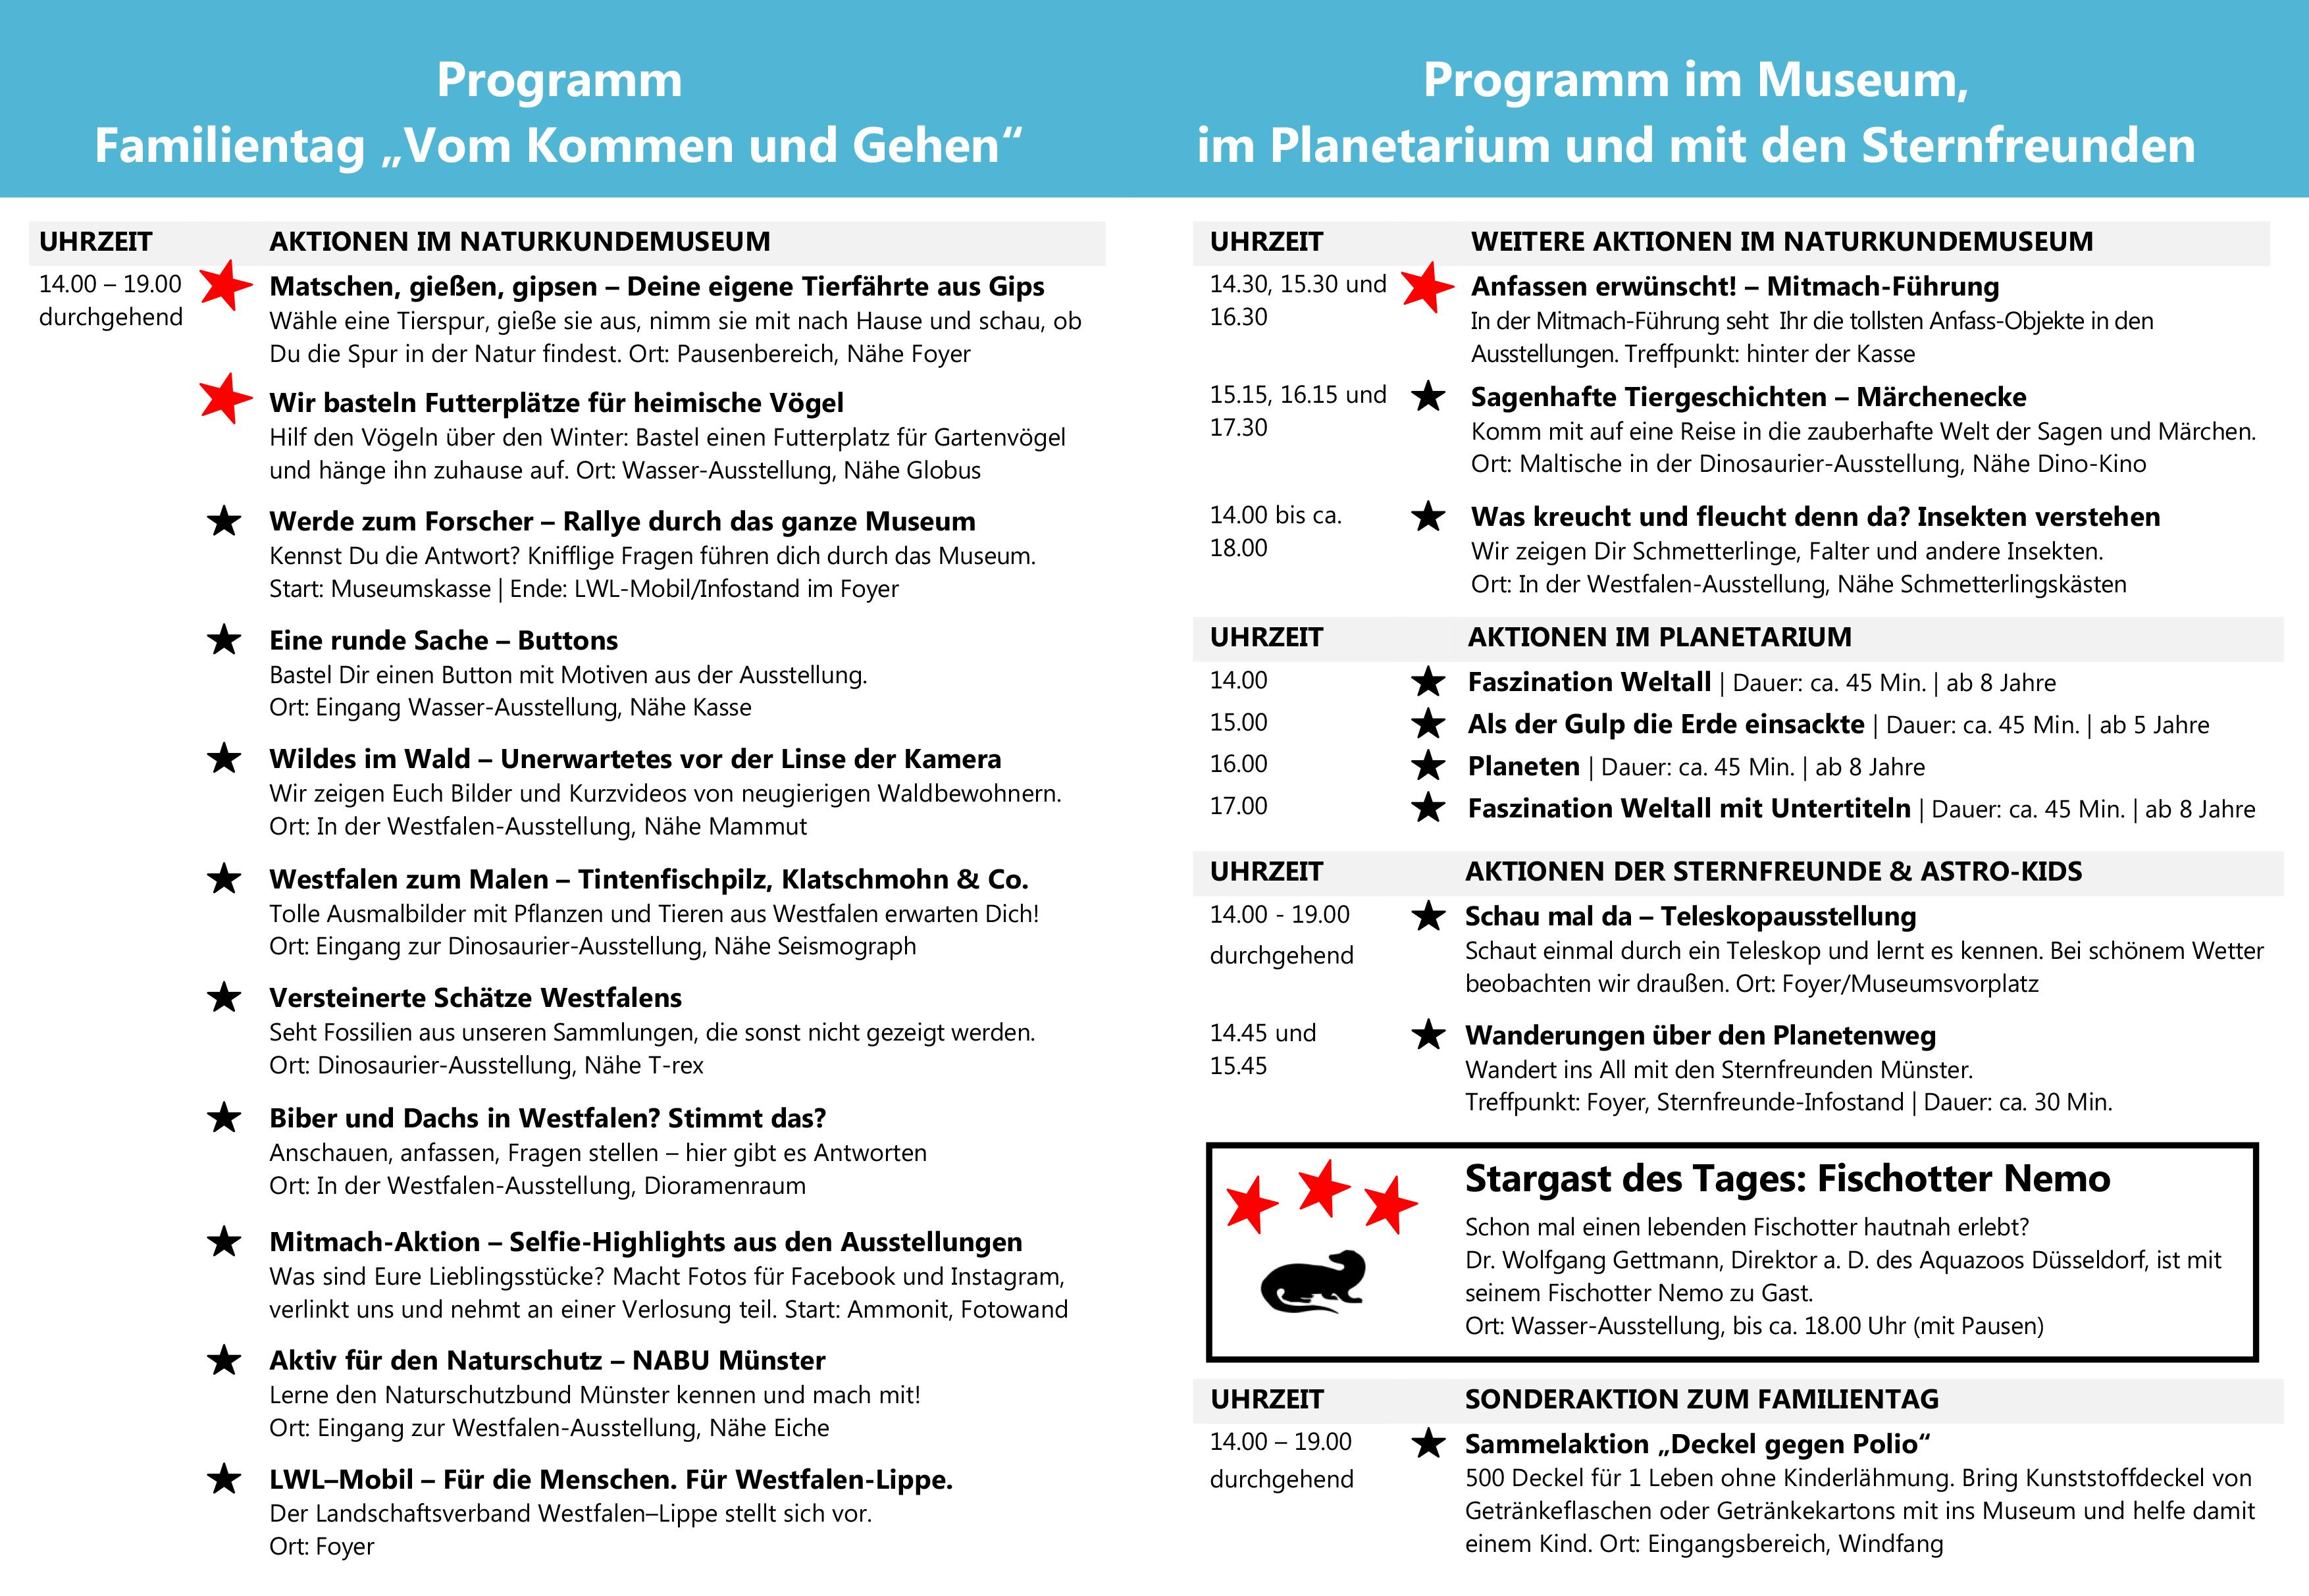 Bilddatei: Programm_innen_FamTag2017.jpg